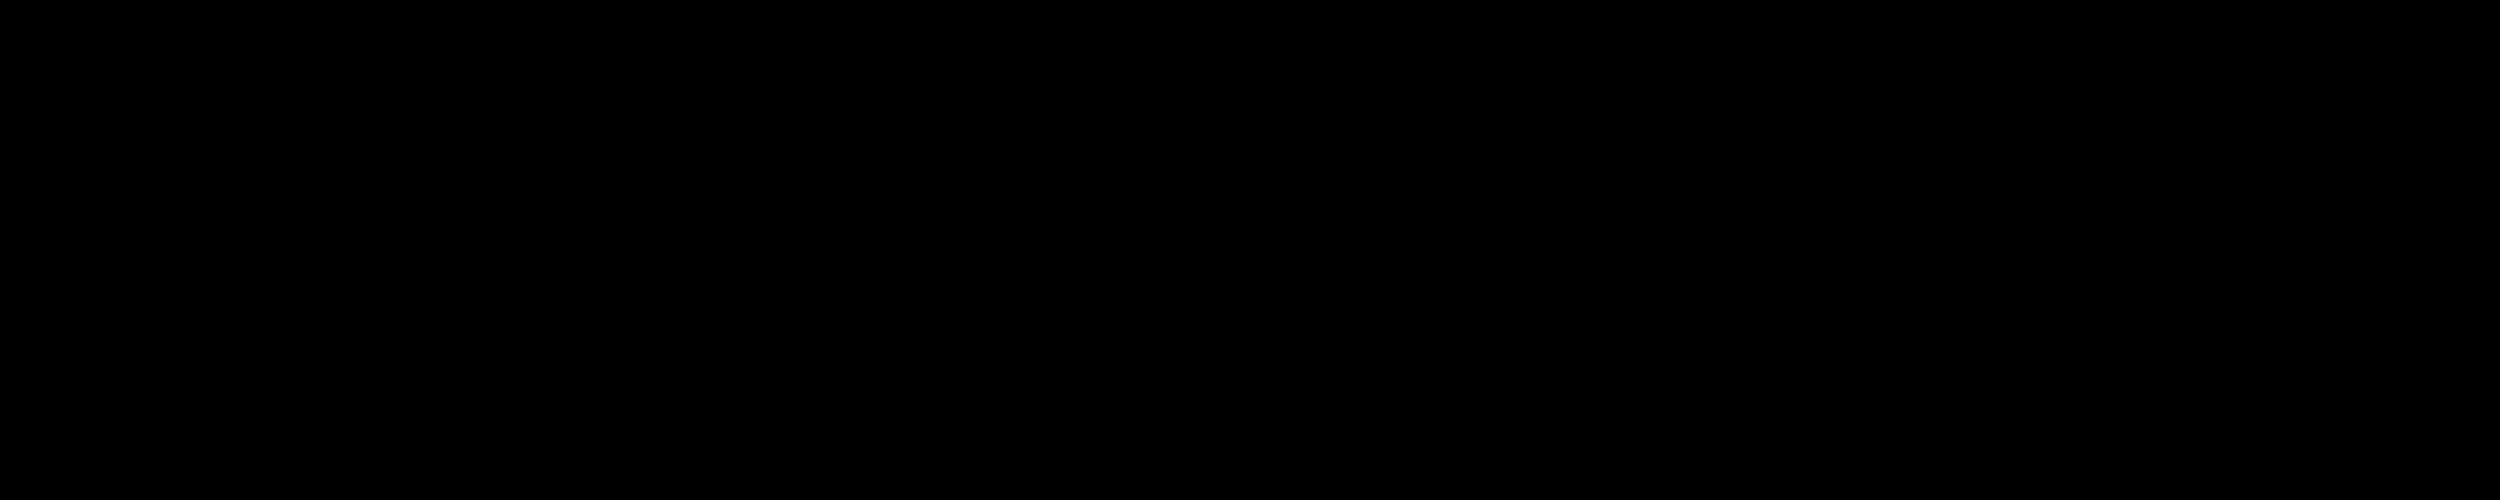 YETI-01.png